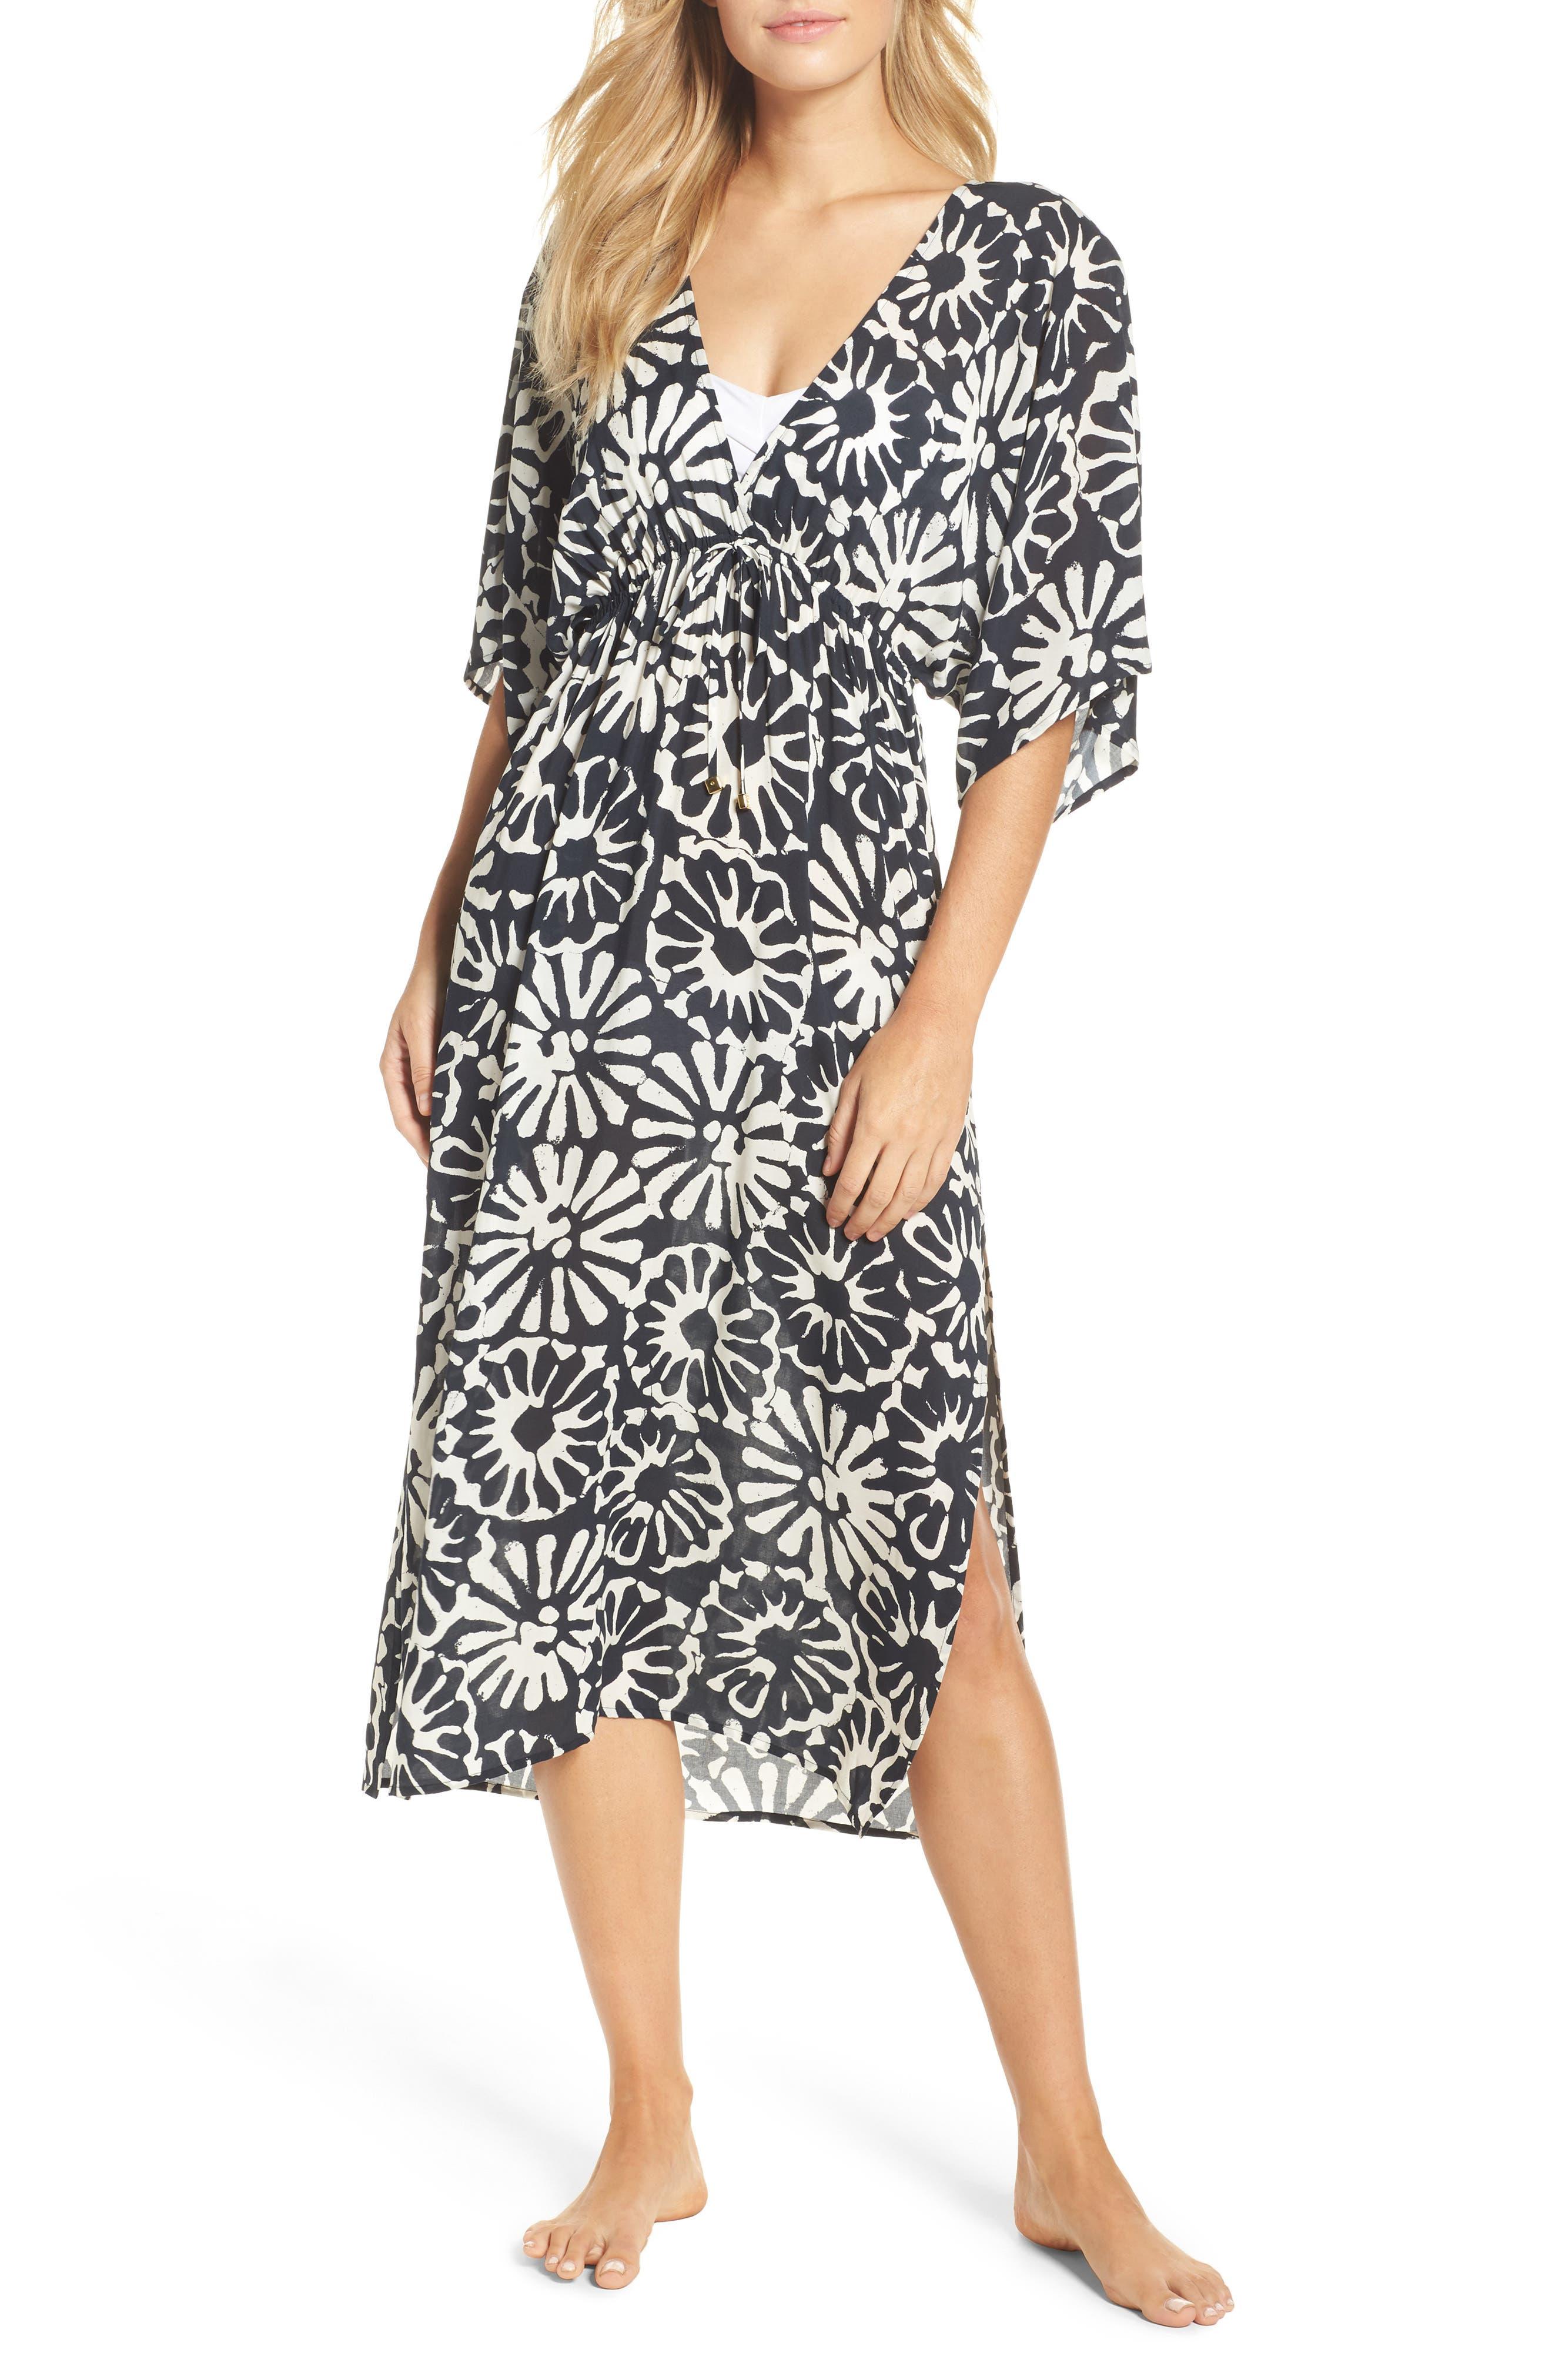 Pomelo Floral Cover-Up Dress,                             Main thumbnail 1, color,